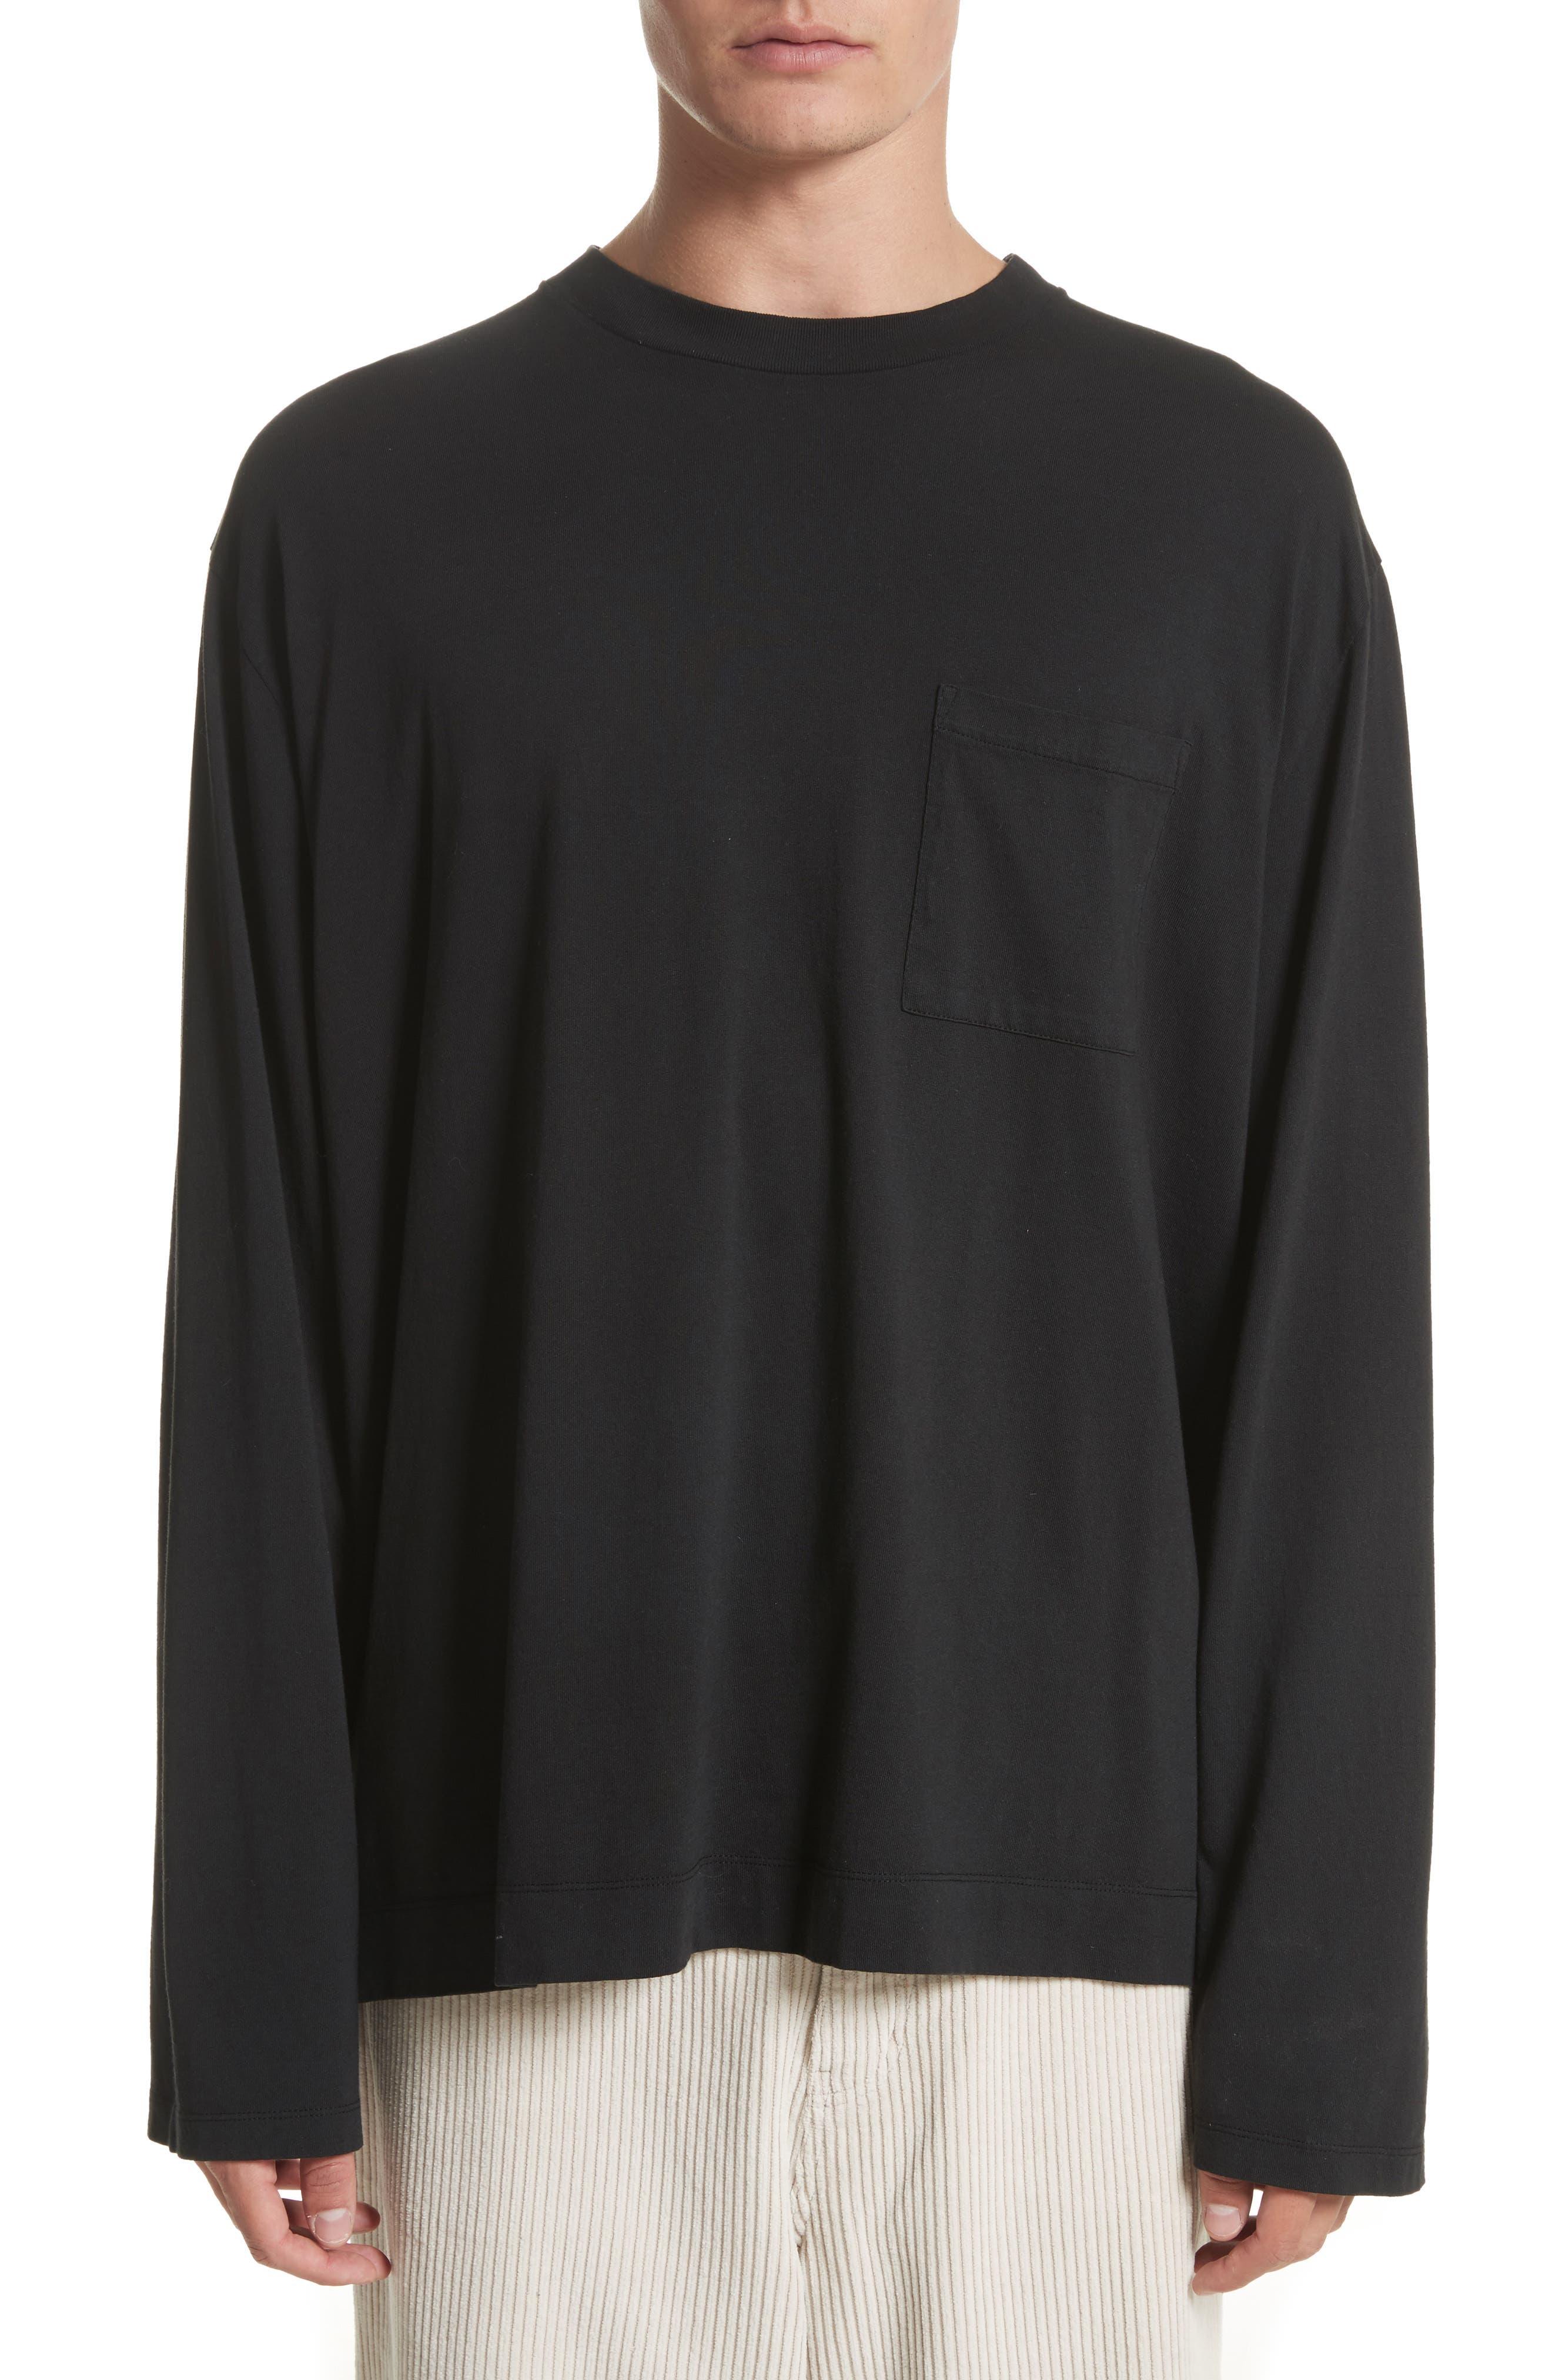 Main Image - OUR LEGACY Long Sleeve Pocket T-Shirt